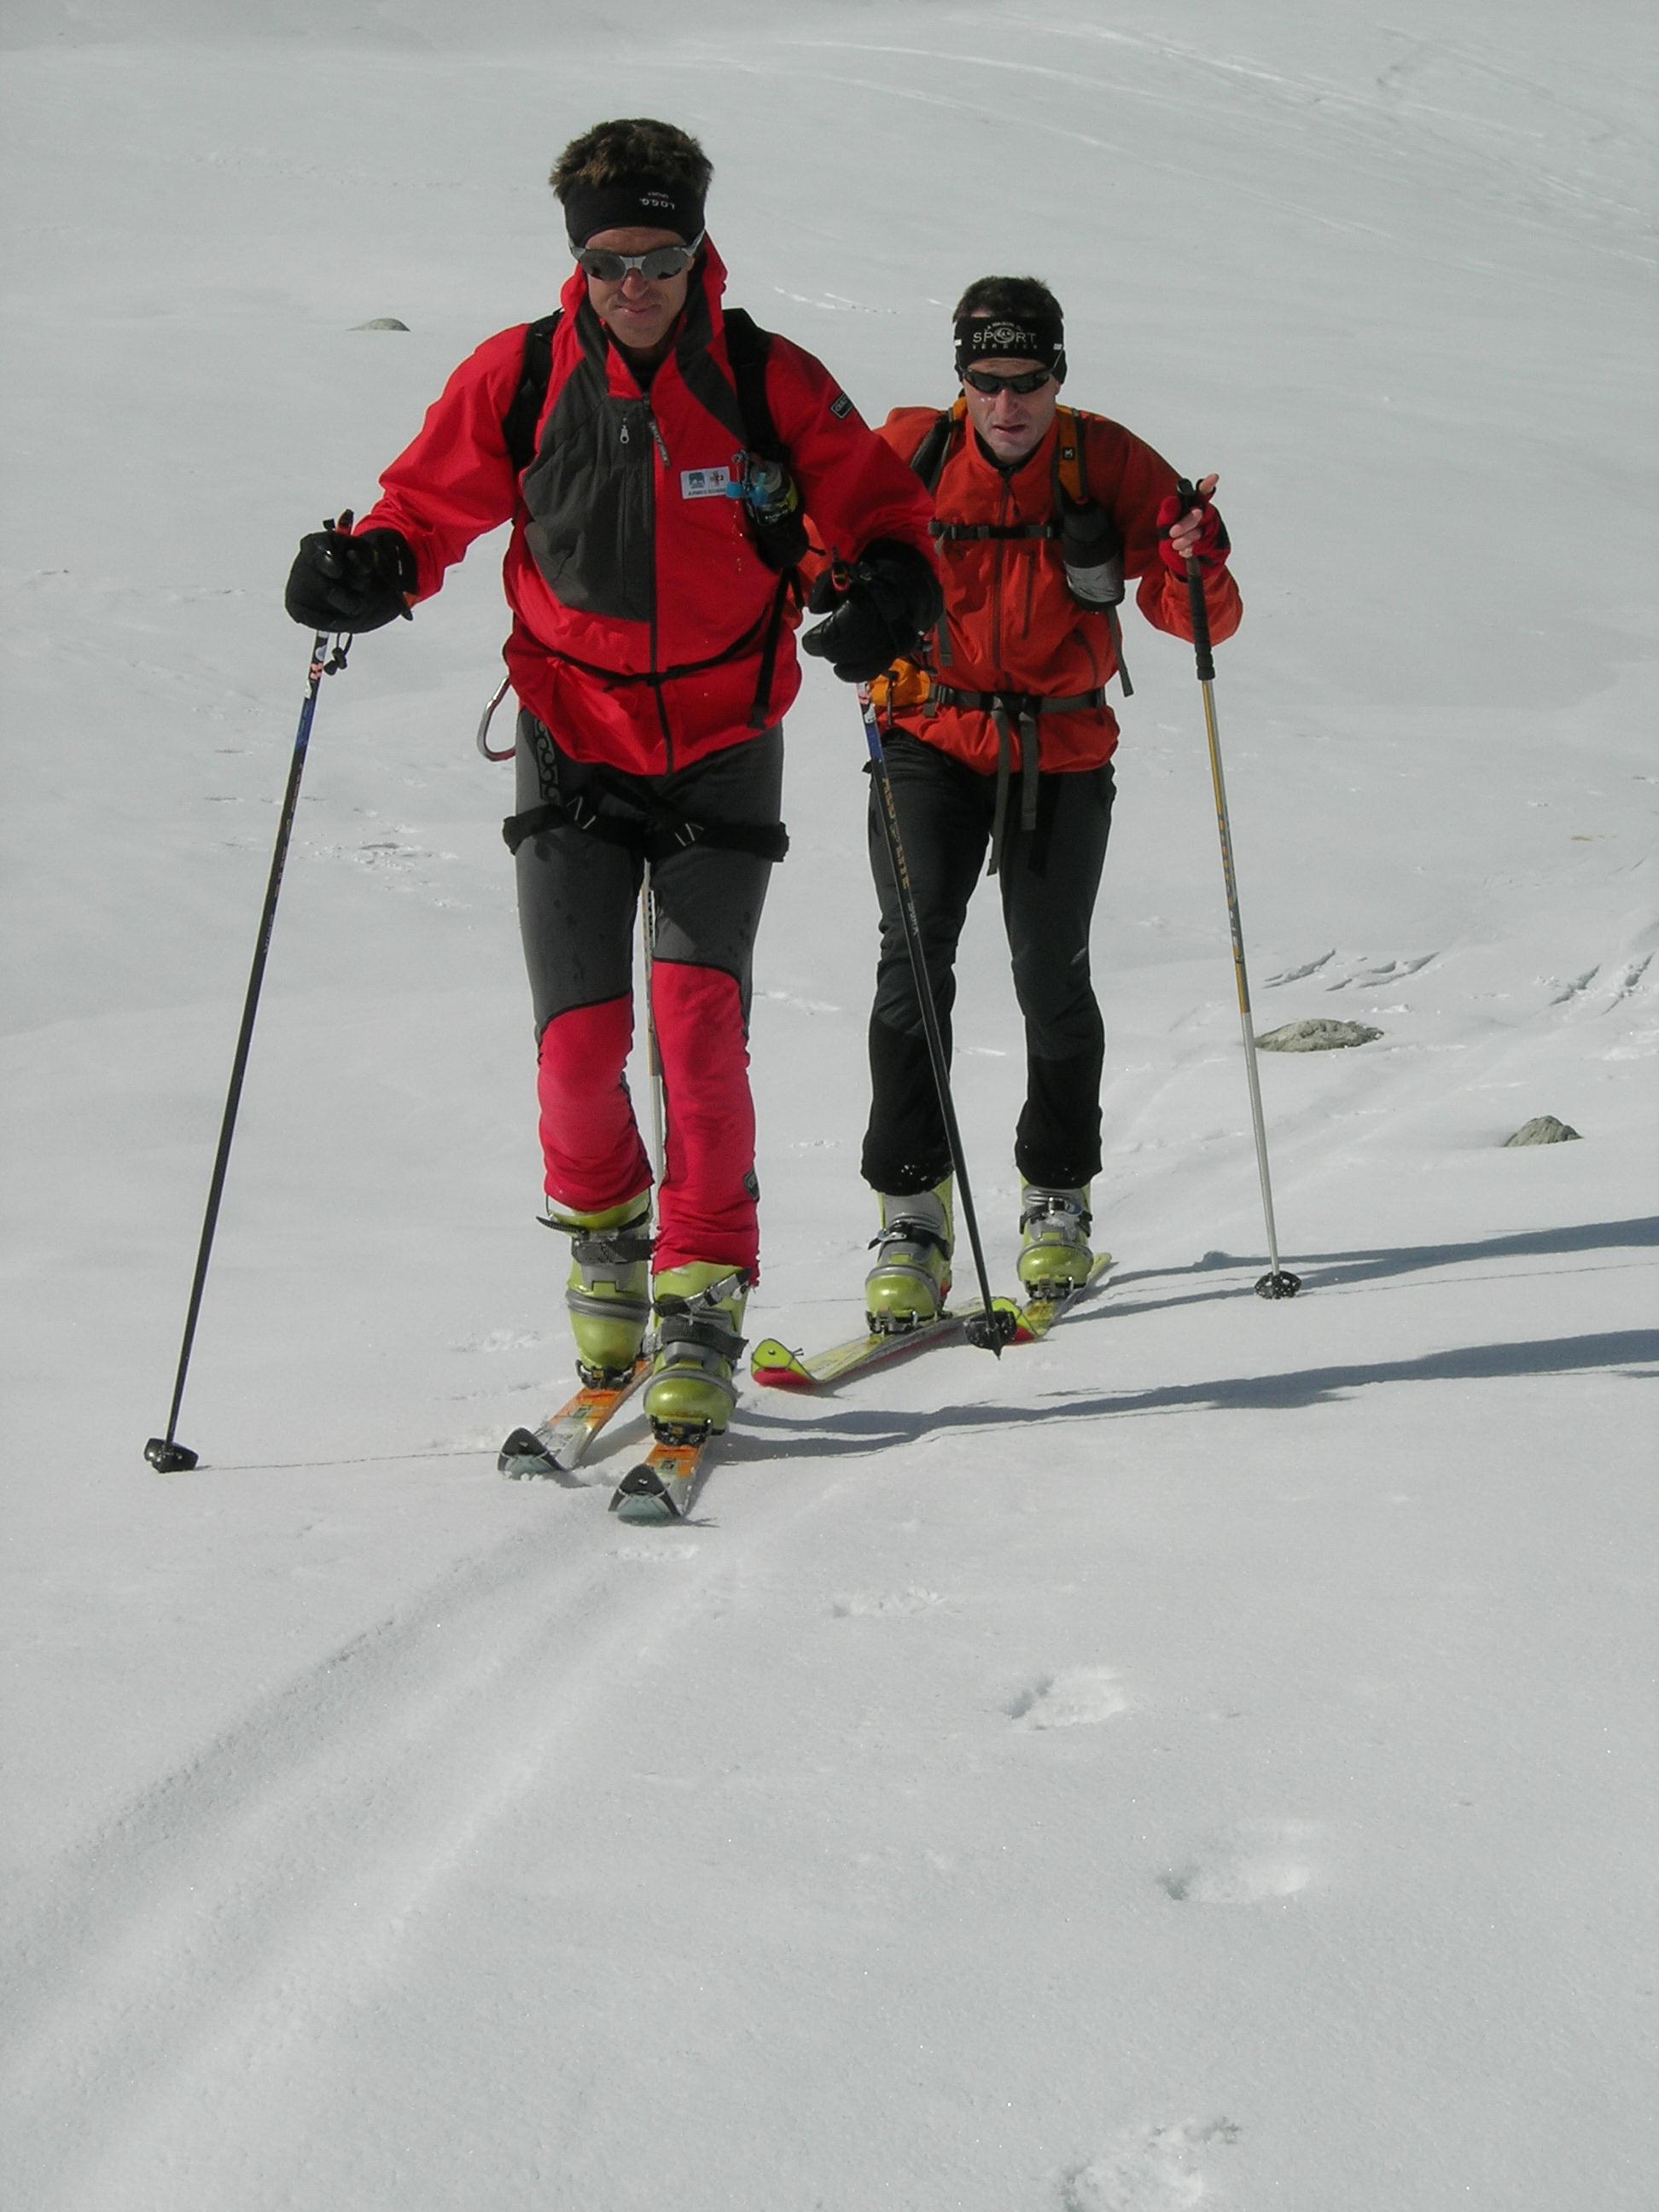 Cham-Zermatt2005